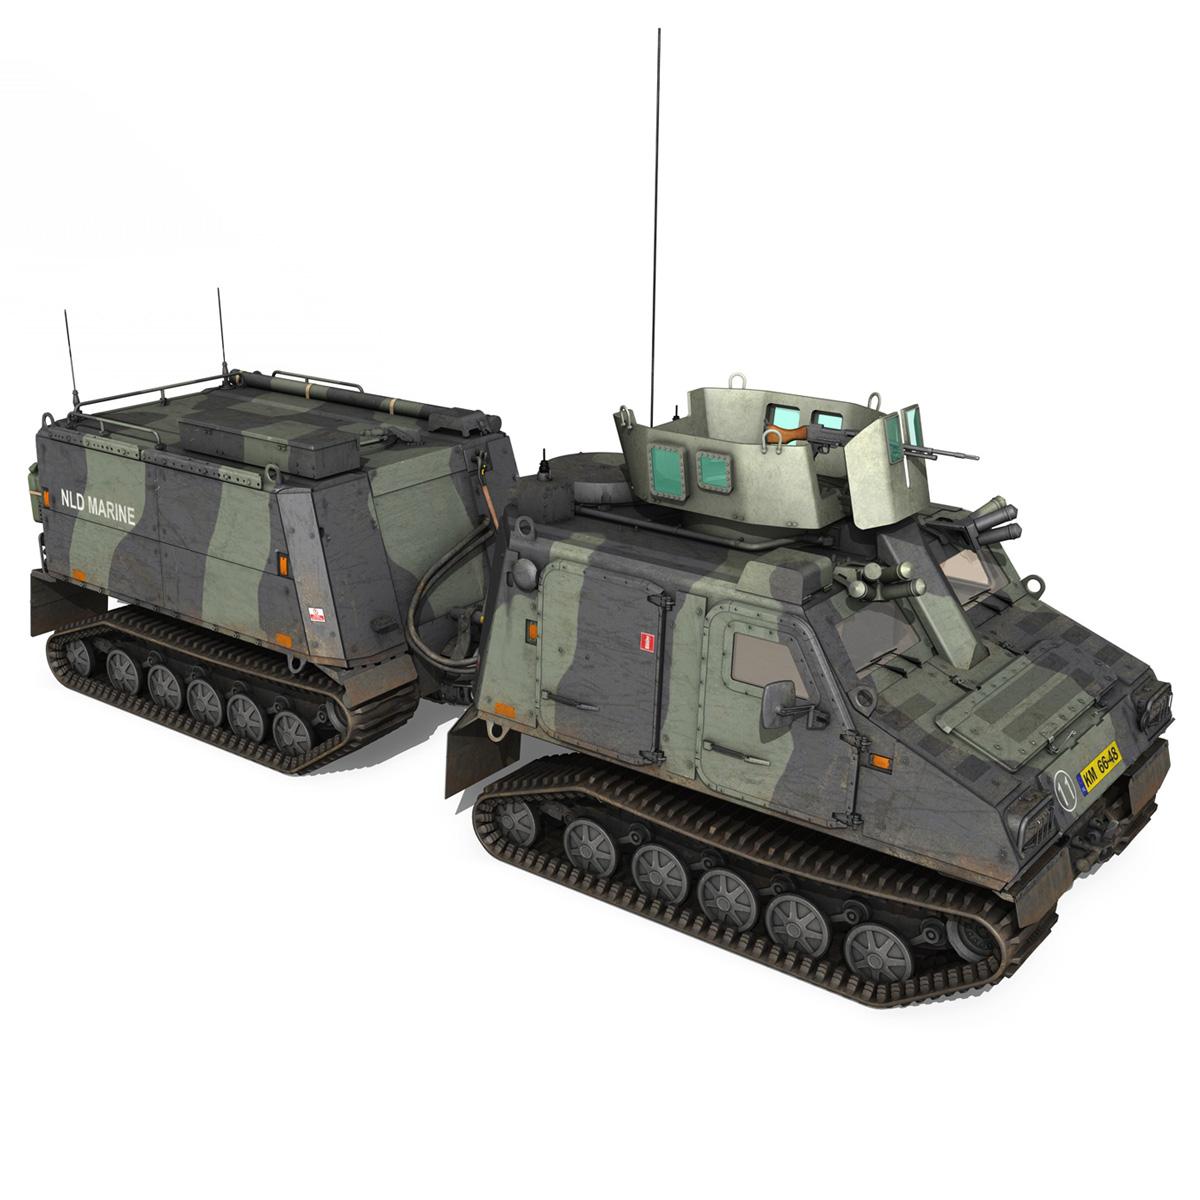 bvs10 viking – netherlands marine corps 3d model 3ds c4d lwo obj 293523